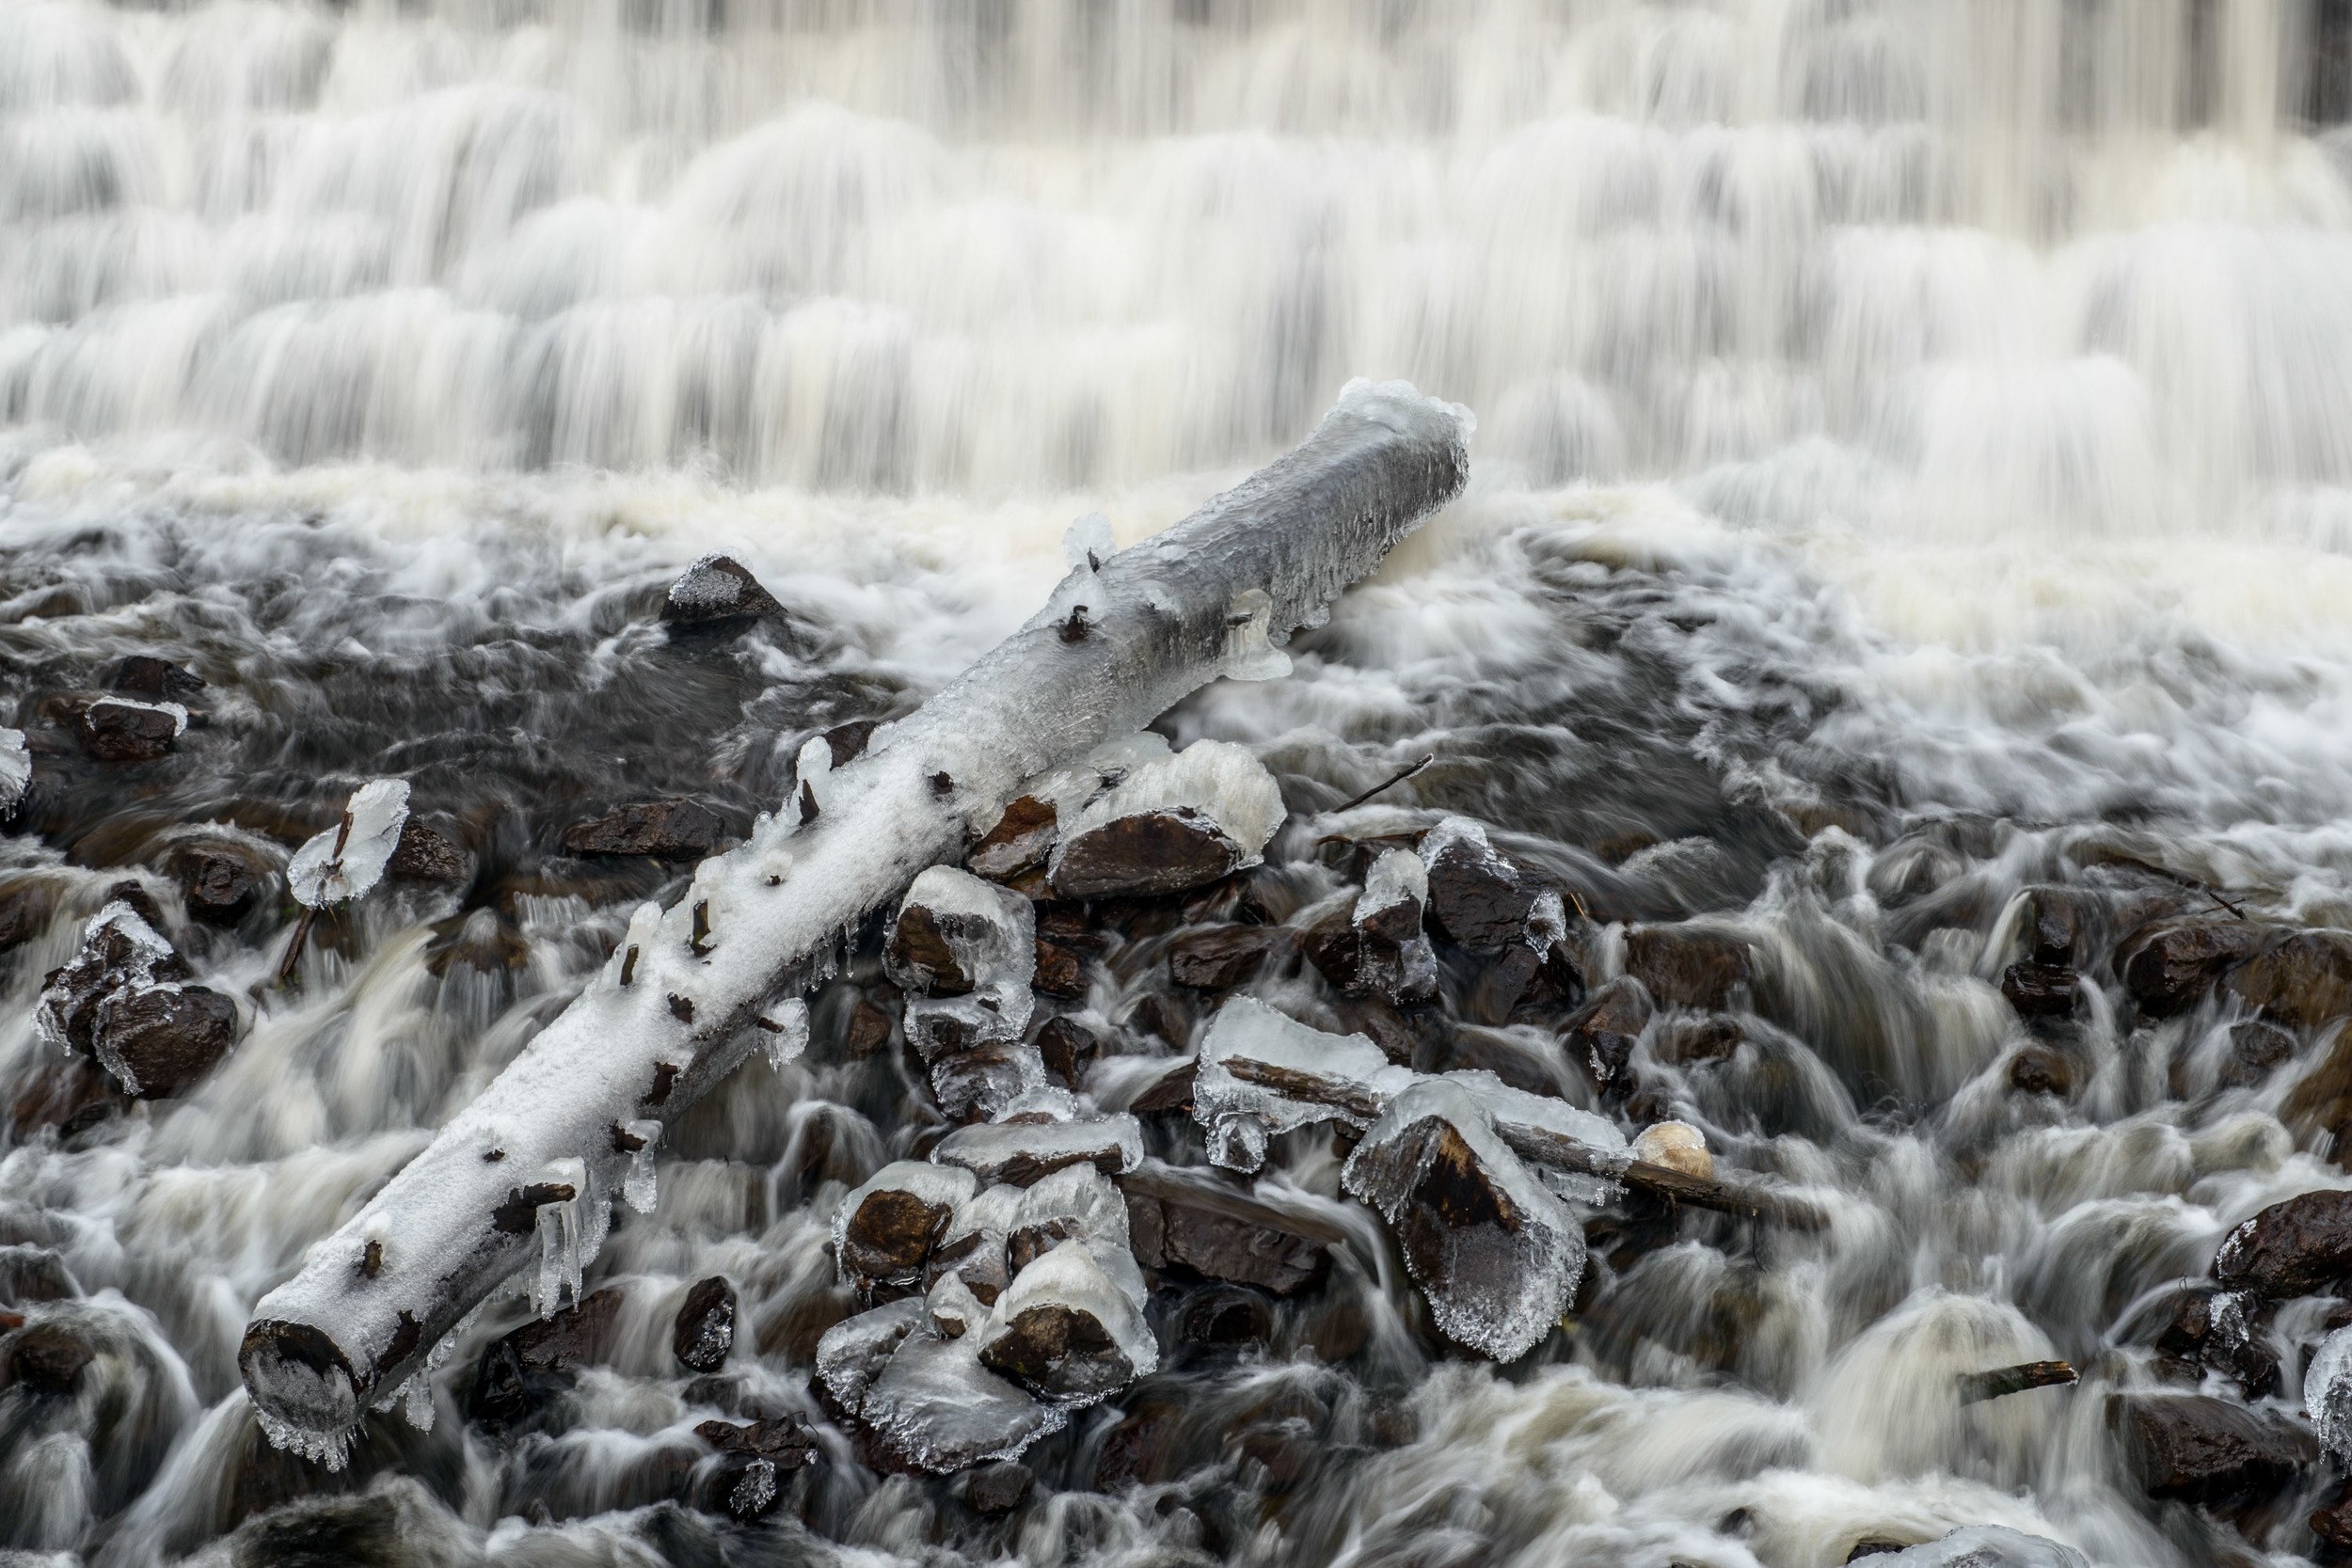 Waterfall in February